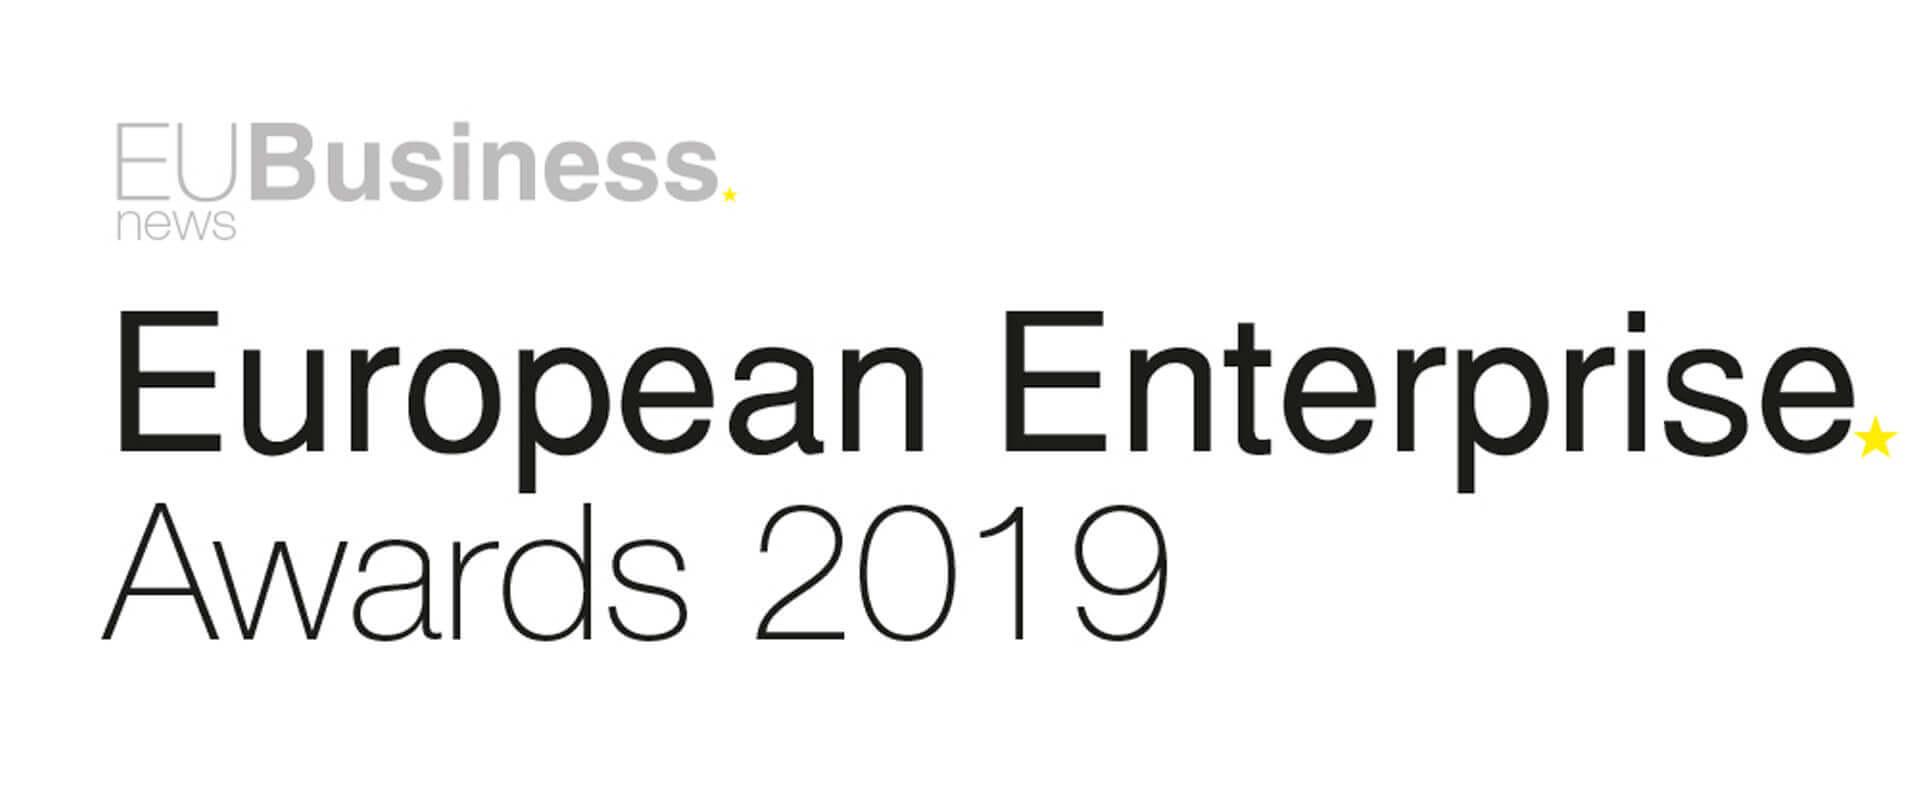 EU Business News Announce the Winners of the 2019 EU